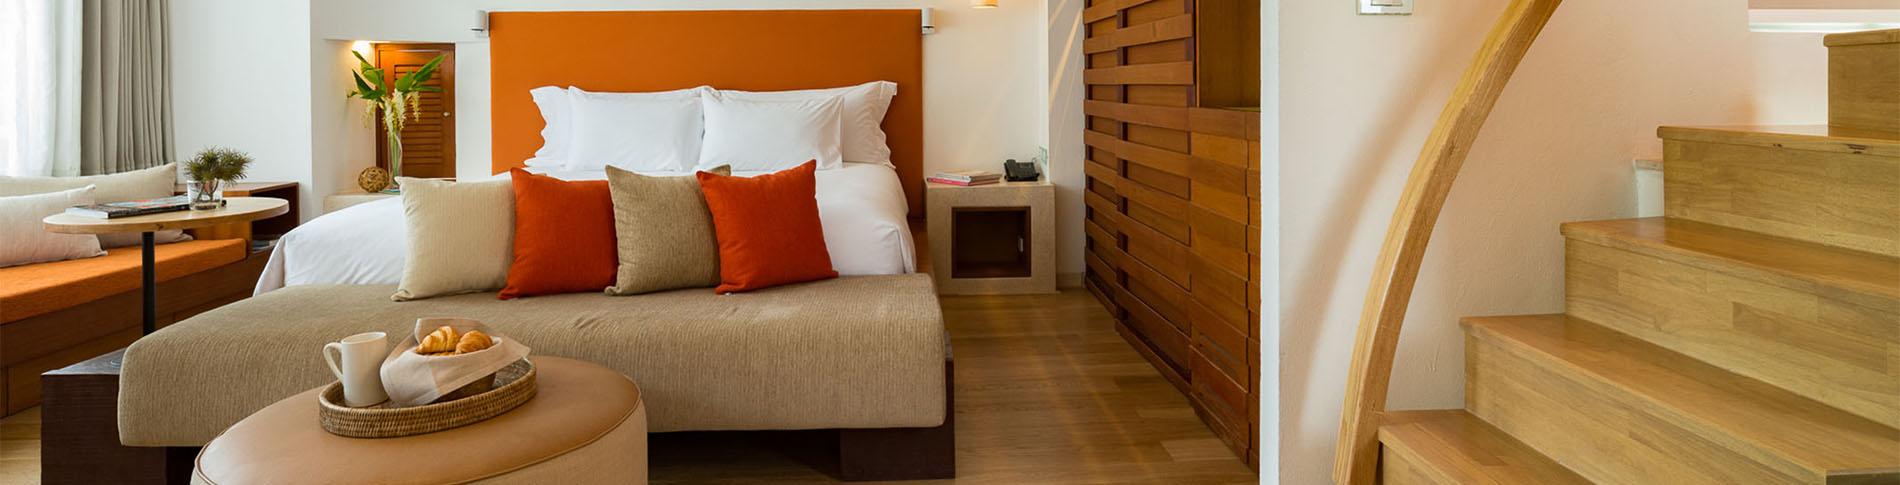 Hua Hin Al Fresco Resort / Best Hotels In Hua Hin